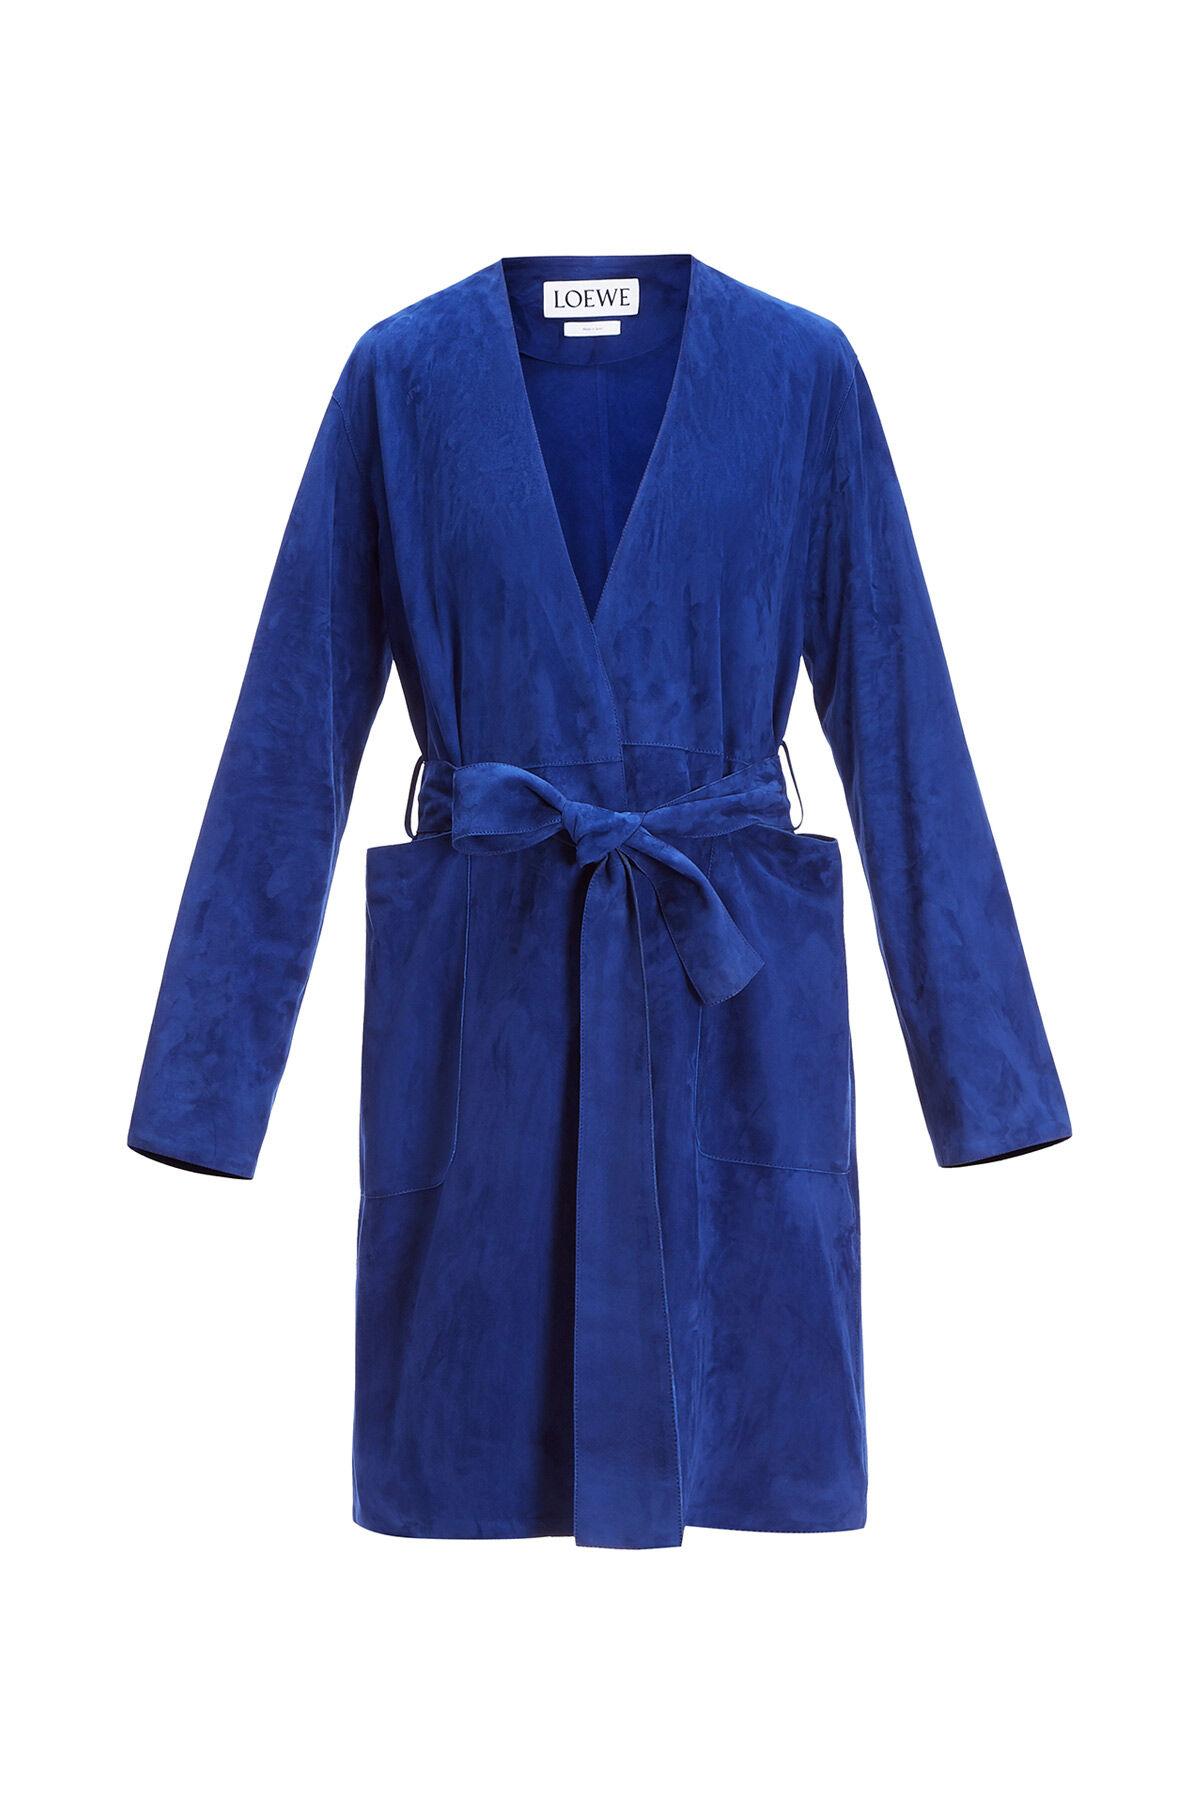 LOEWE Abrigo Azul Royal Oscuro all